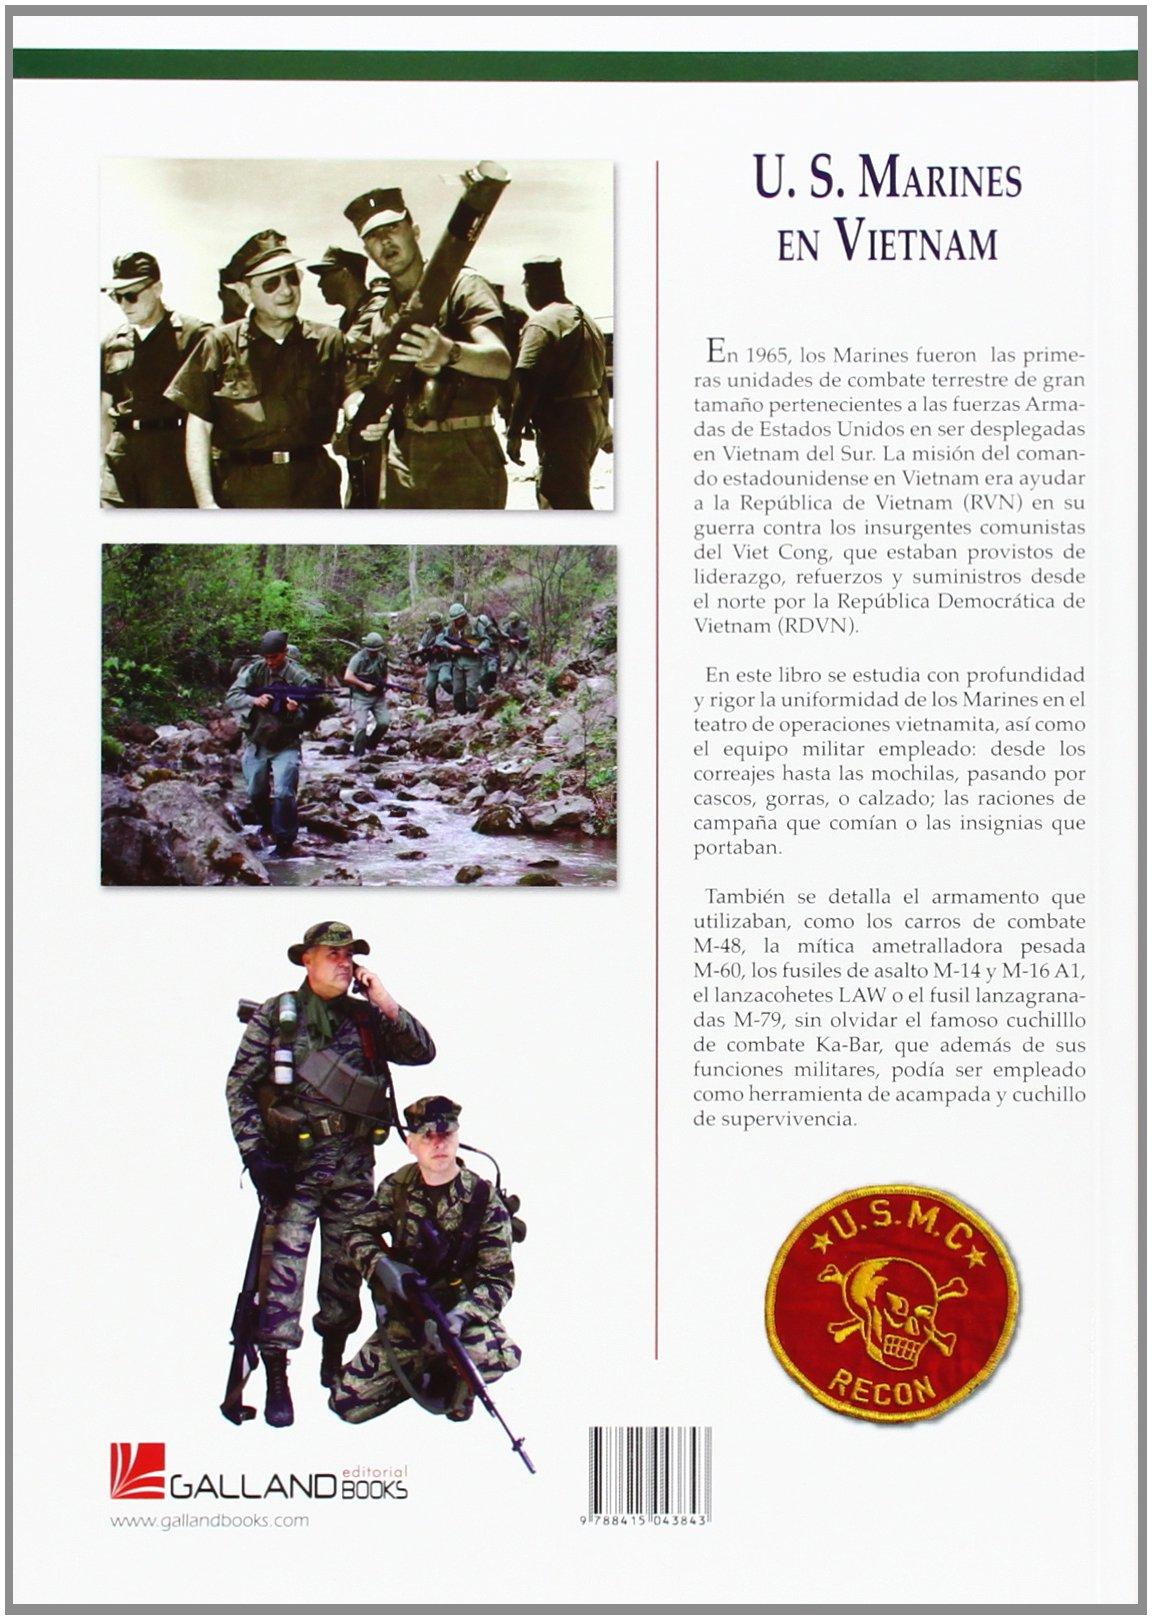 Los marines en la guerra de Vietnam: Martí Demiquels: 9788415043843: Amazon.com: Books